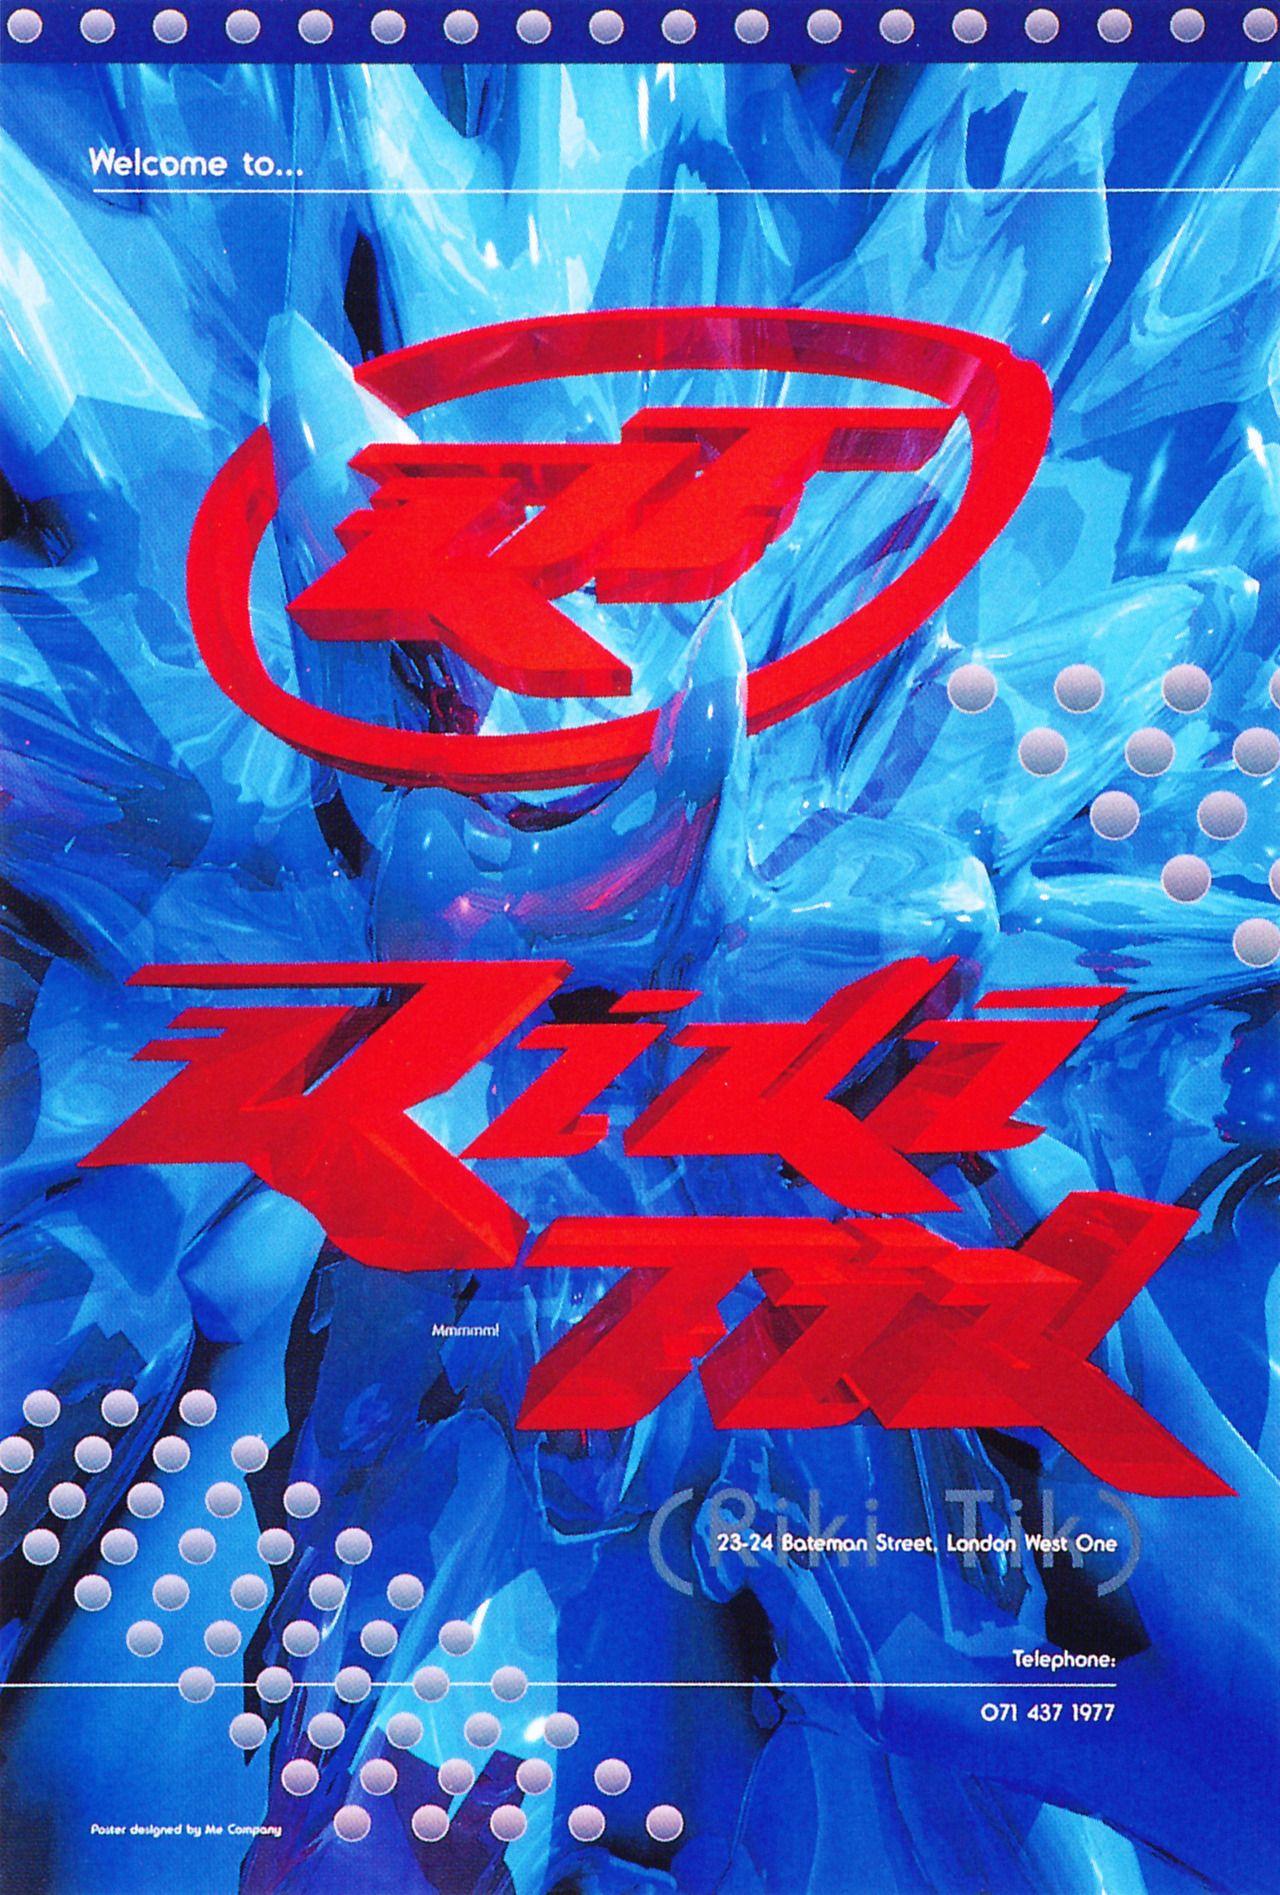 y2k aesthetic poster